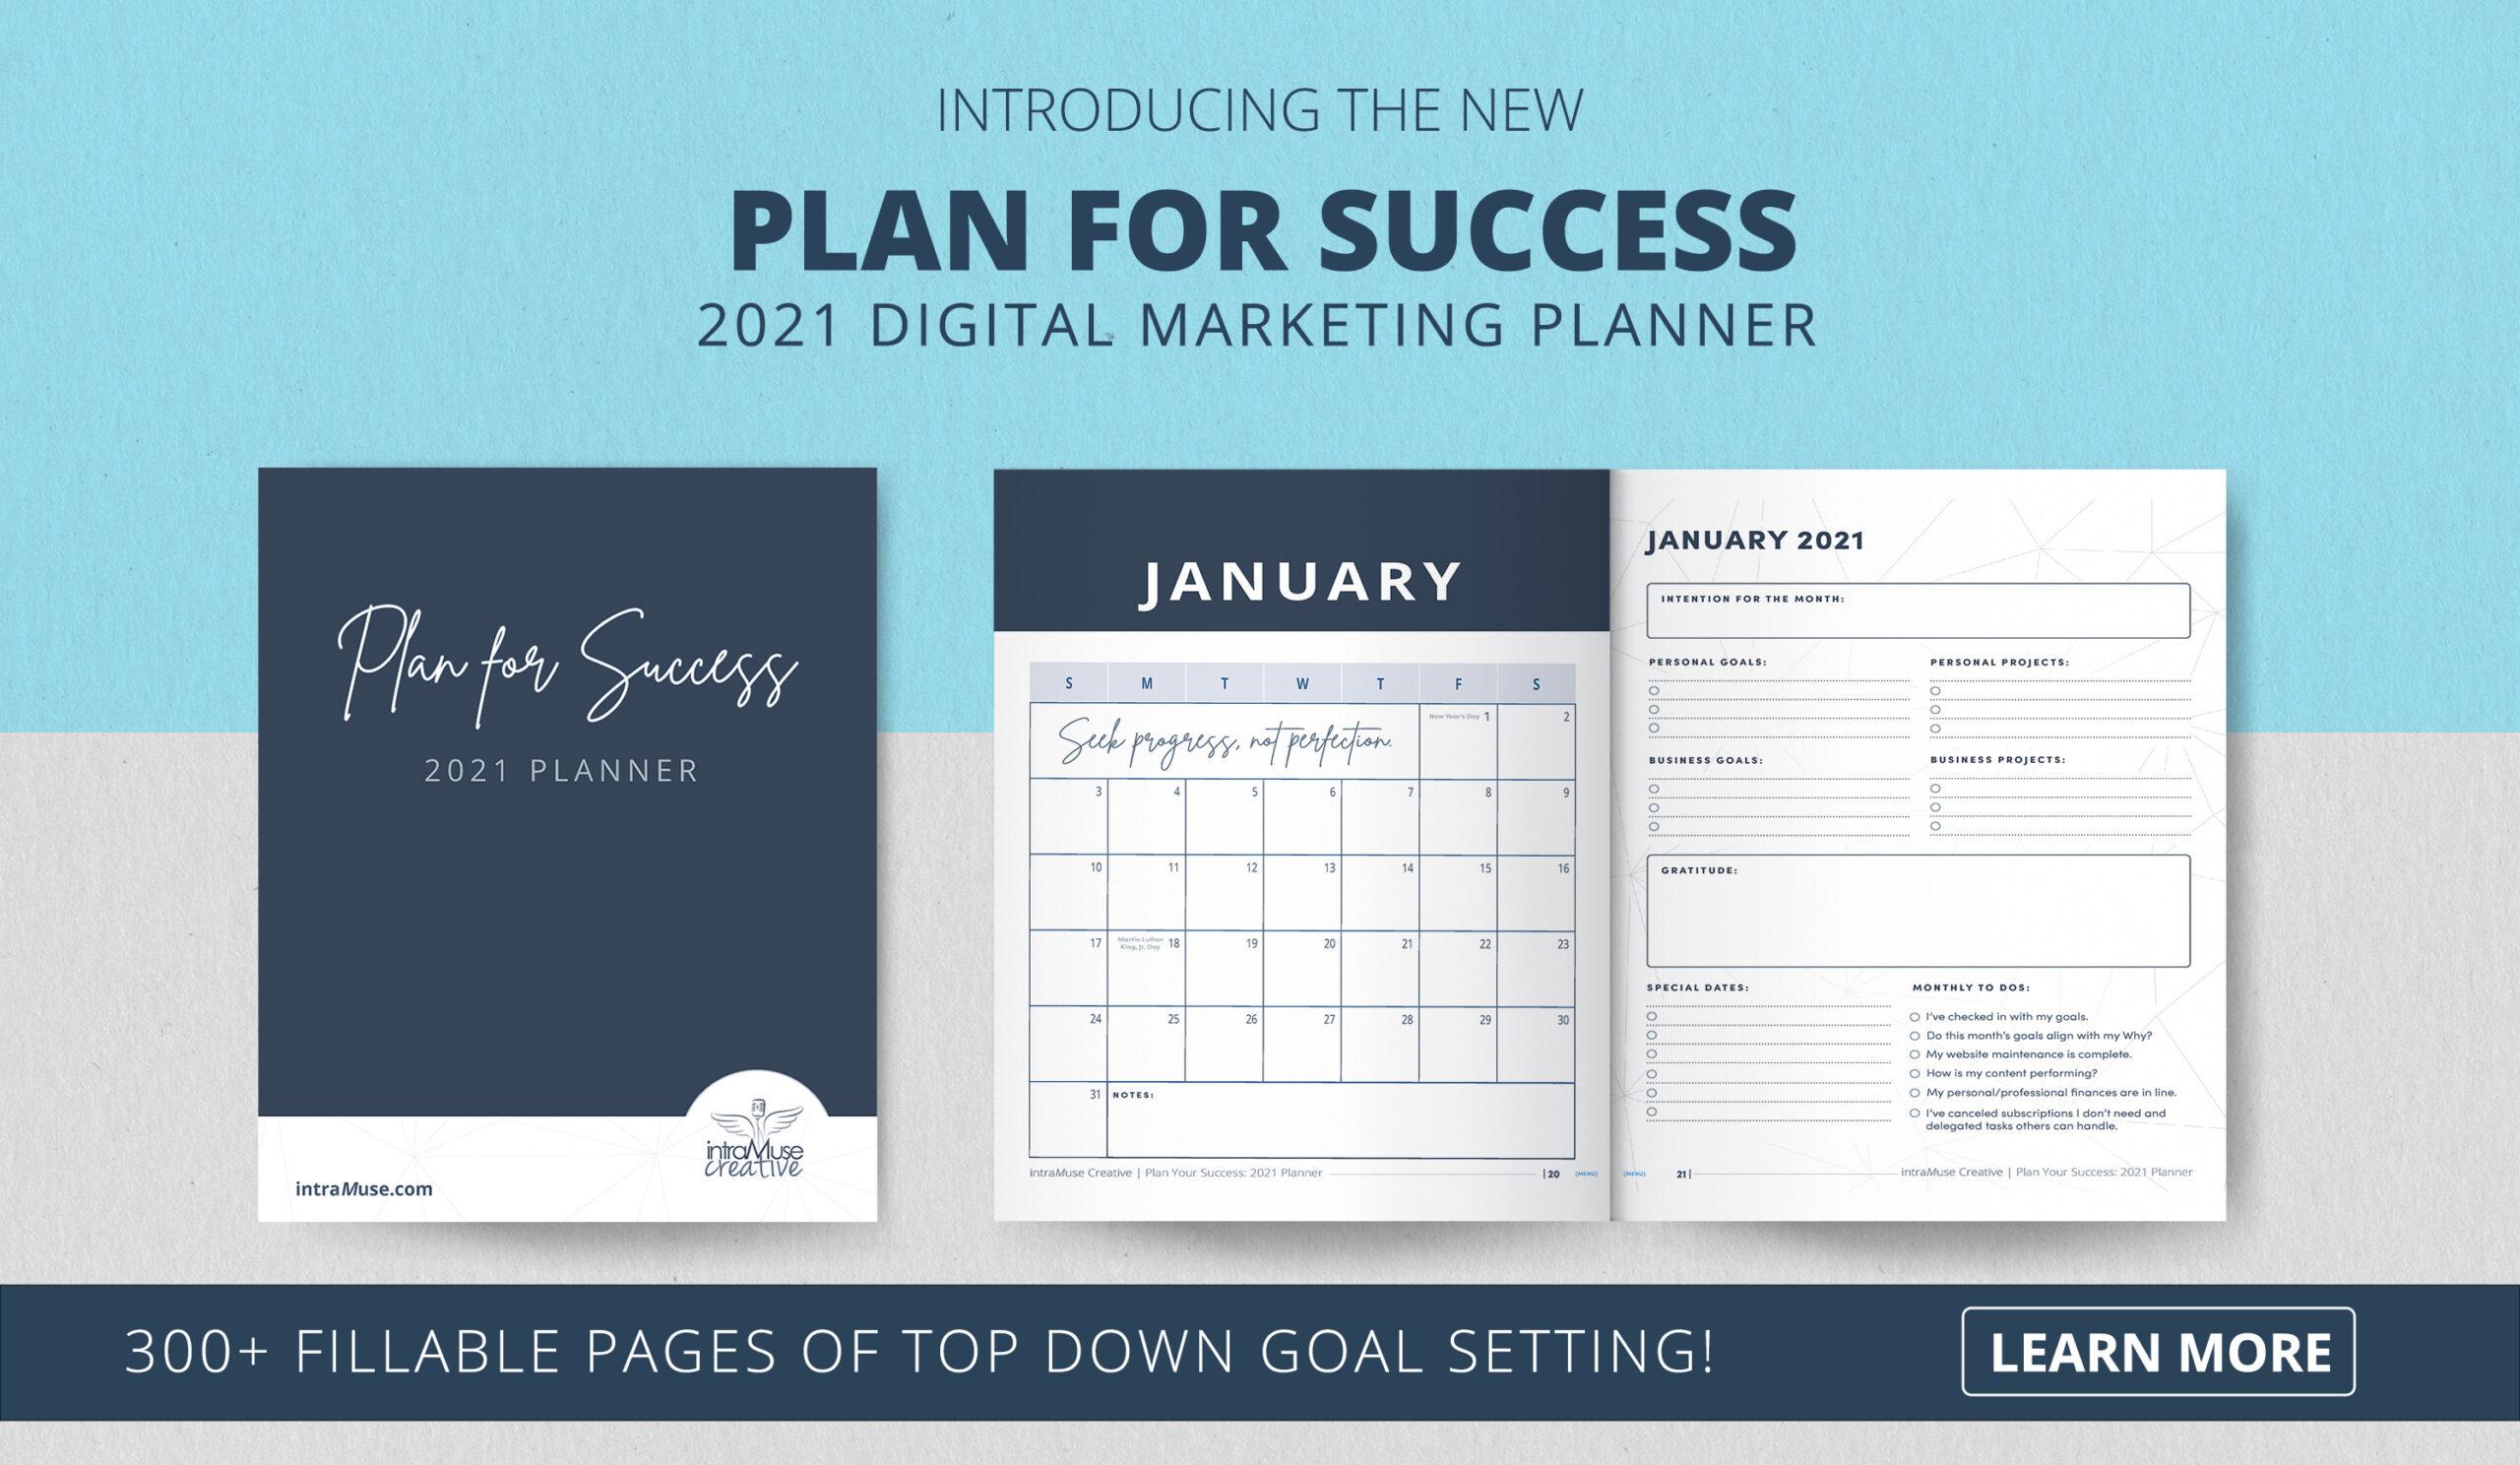 Plan for Success: 2021 Digital Marketing Planner